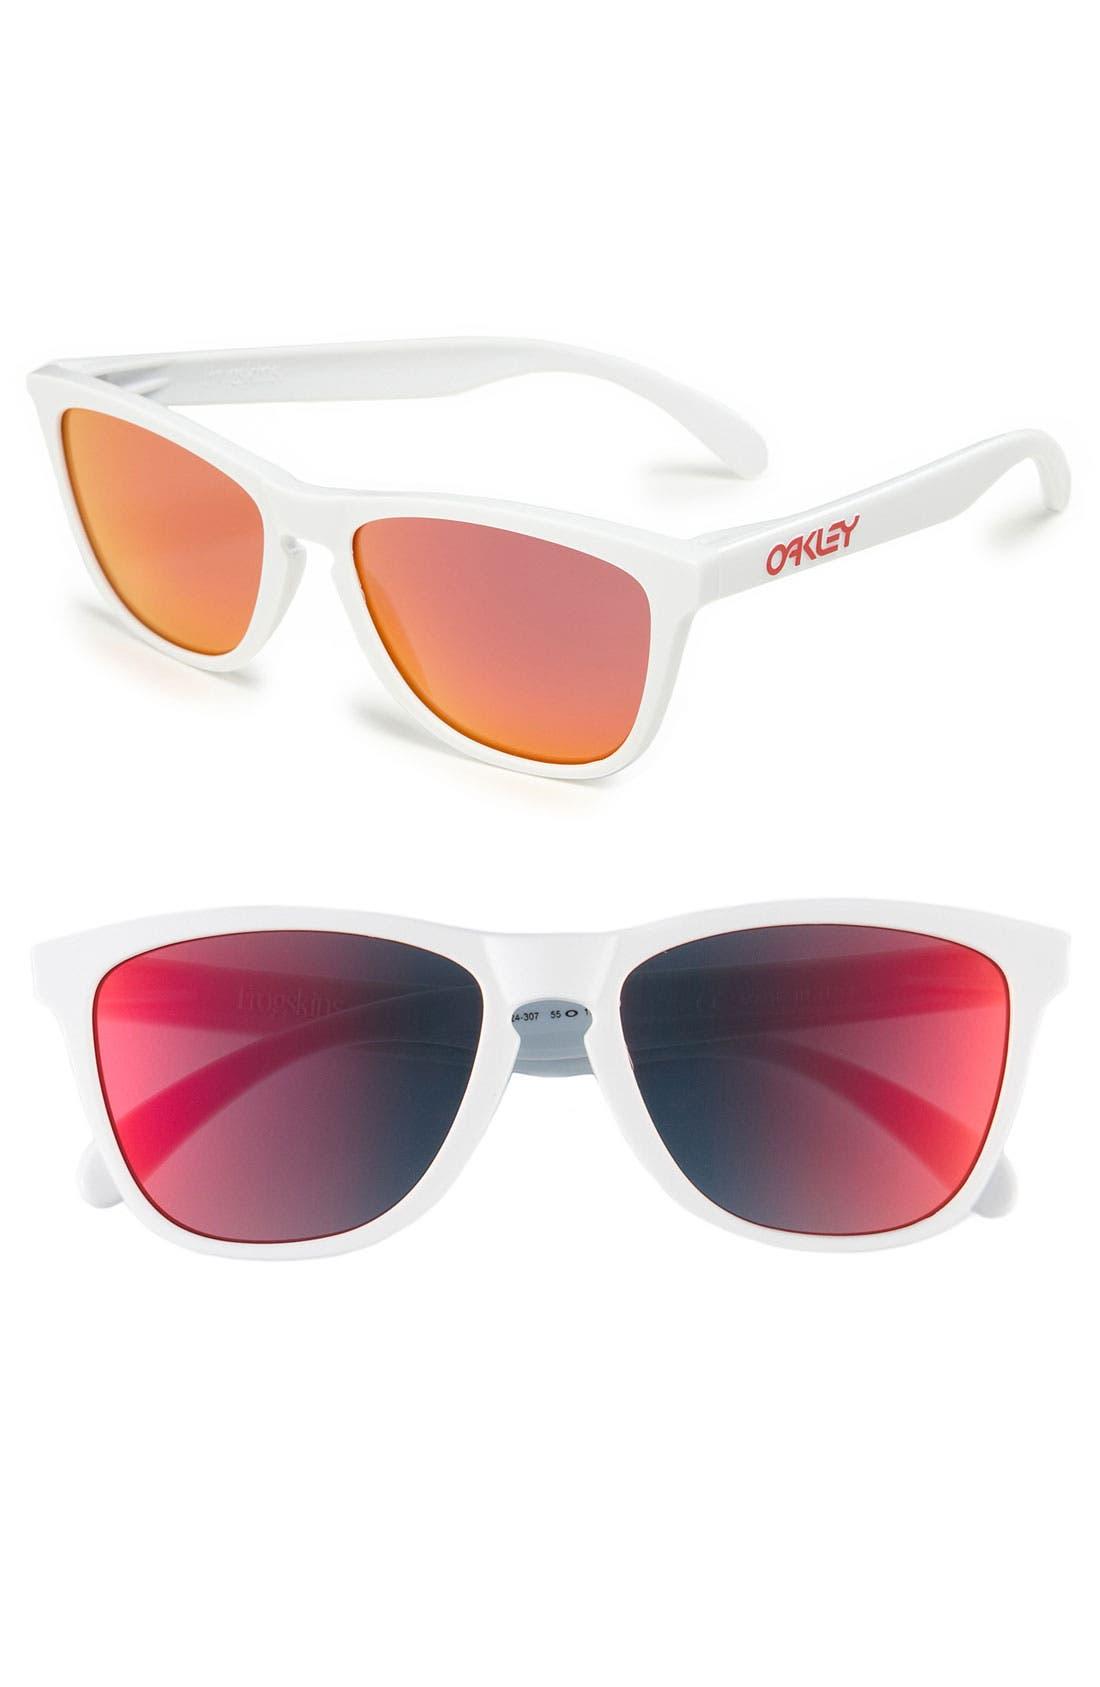 Main Image - Oakley 'Frogskins®' 55mm Sunglasses